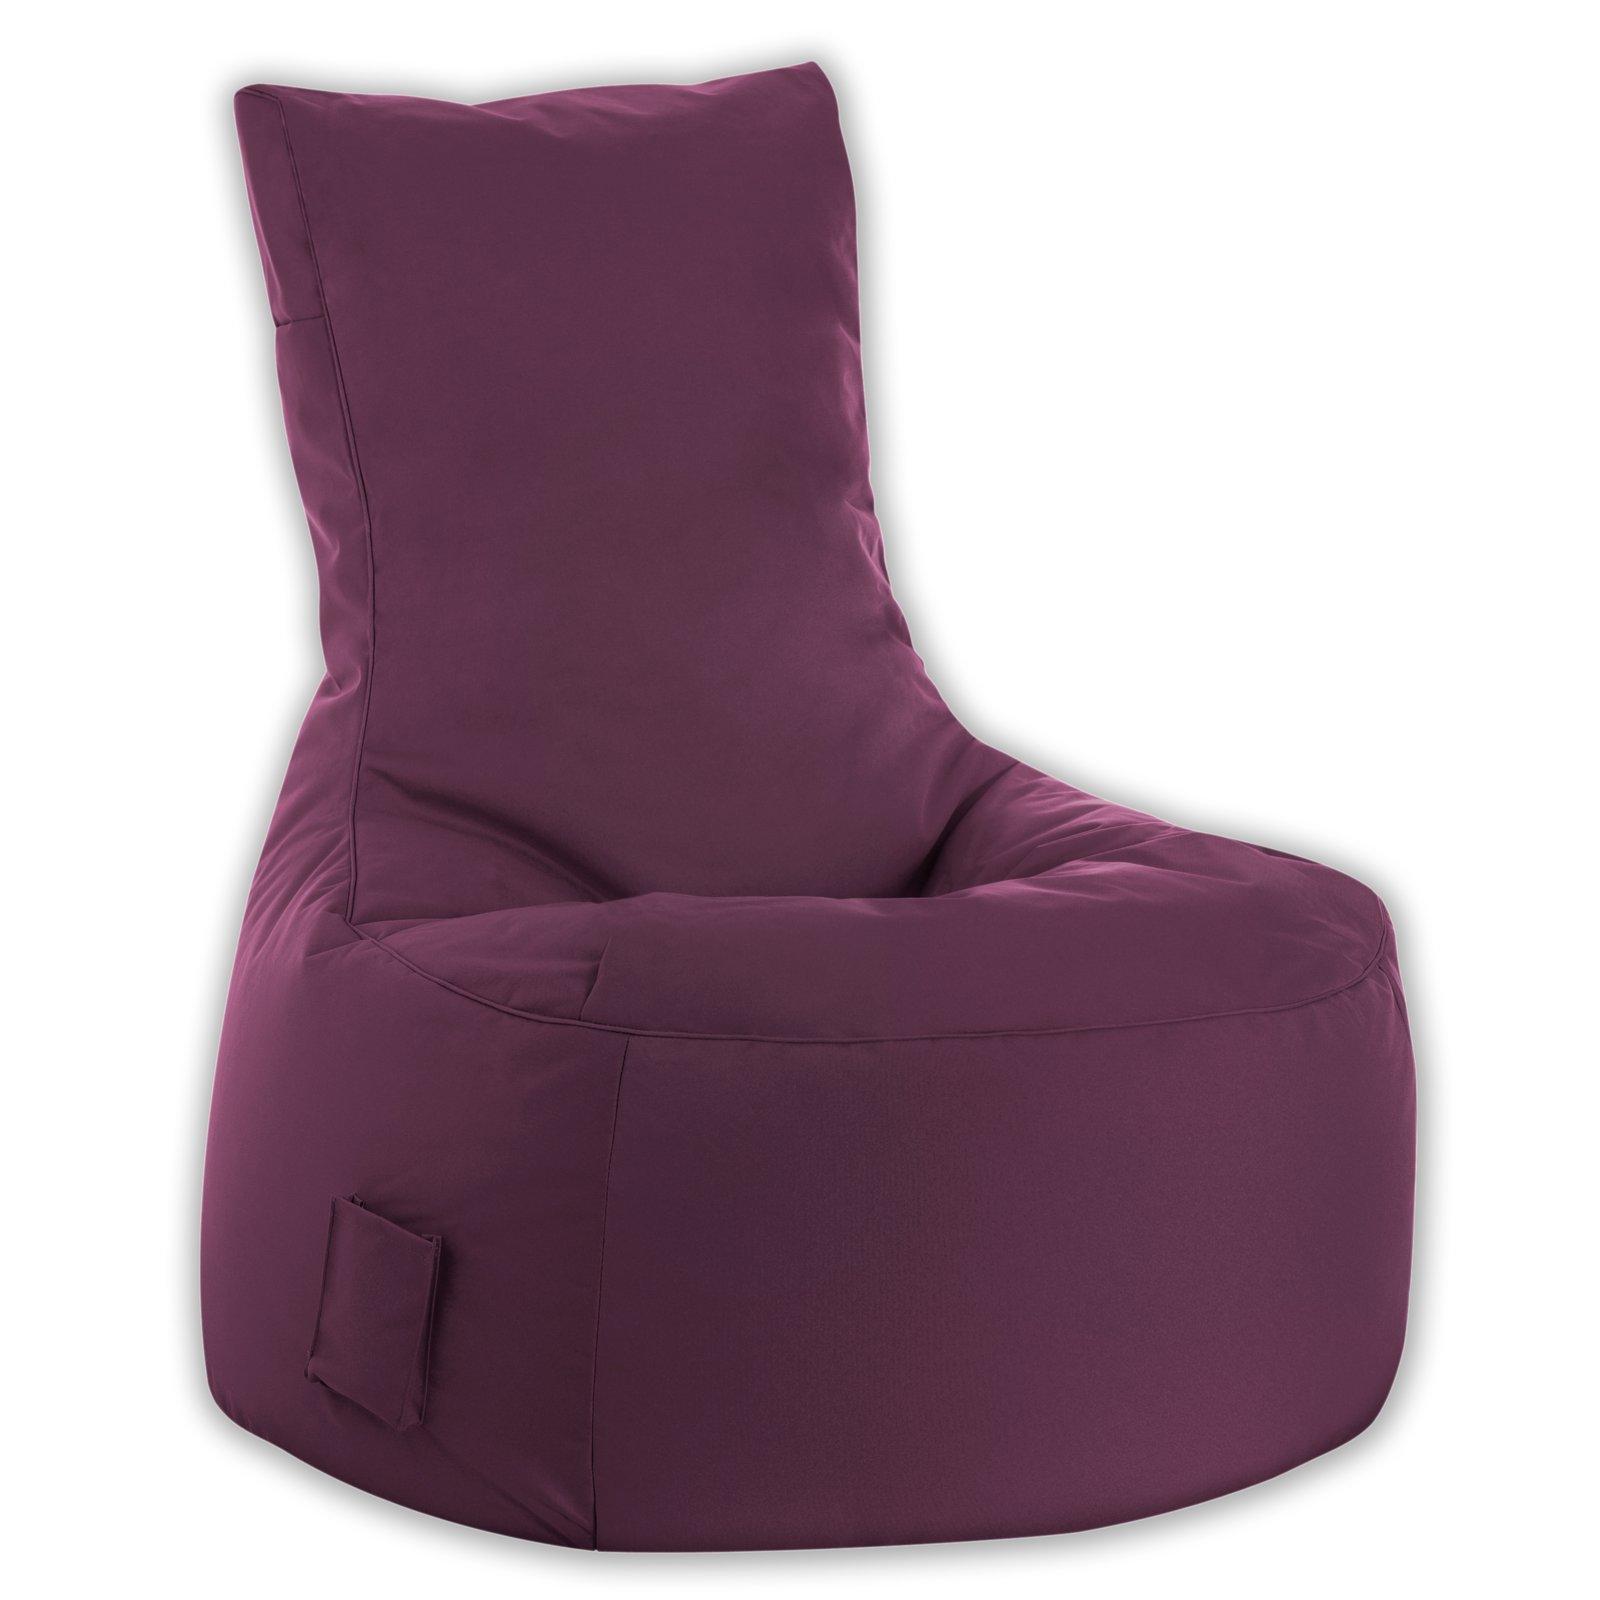 sitting point sitzsack sitting point sitzsack swing scuba. Black Bedroom Furniture Sets. Home Design Ideas